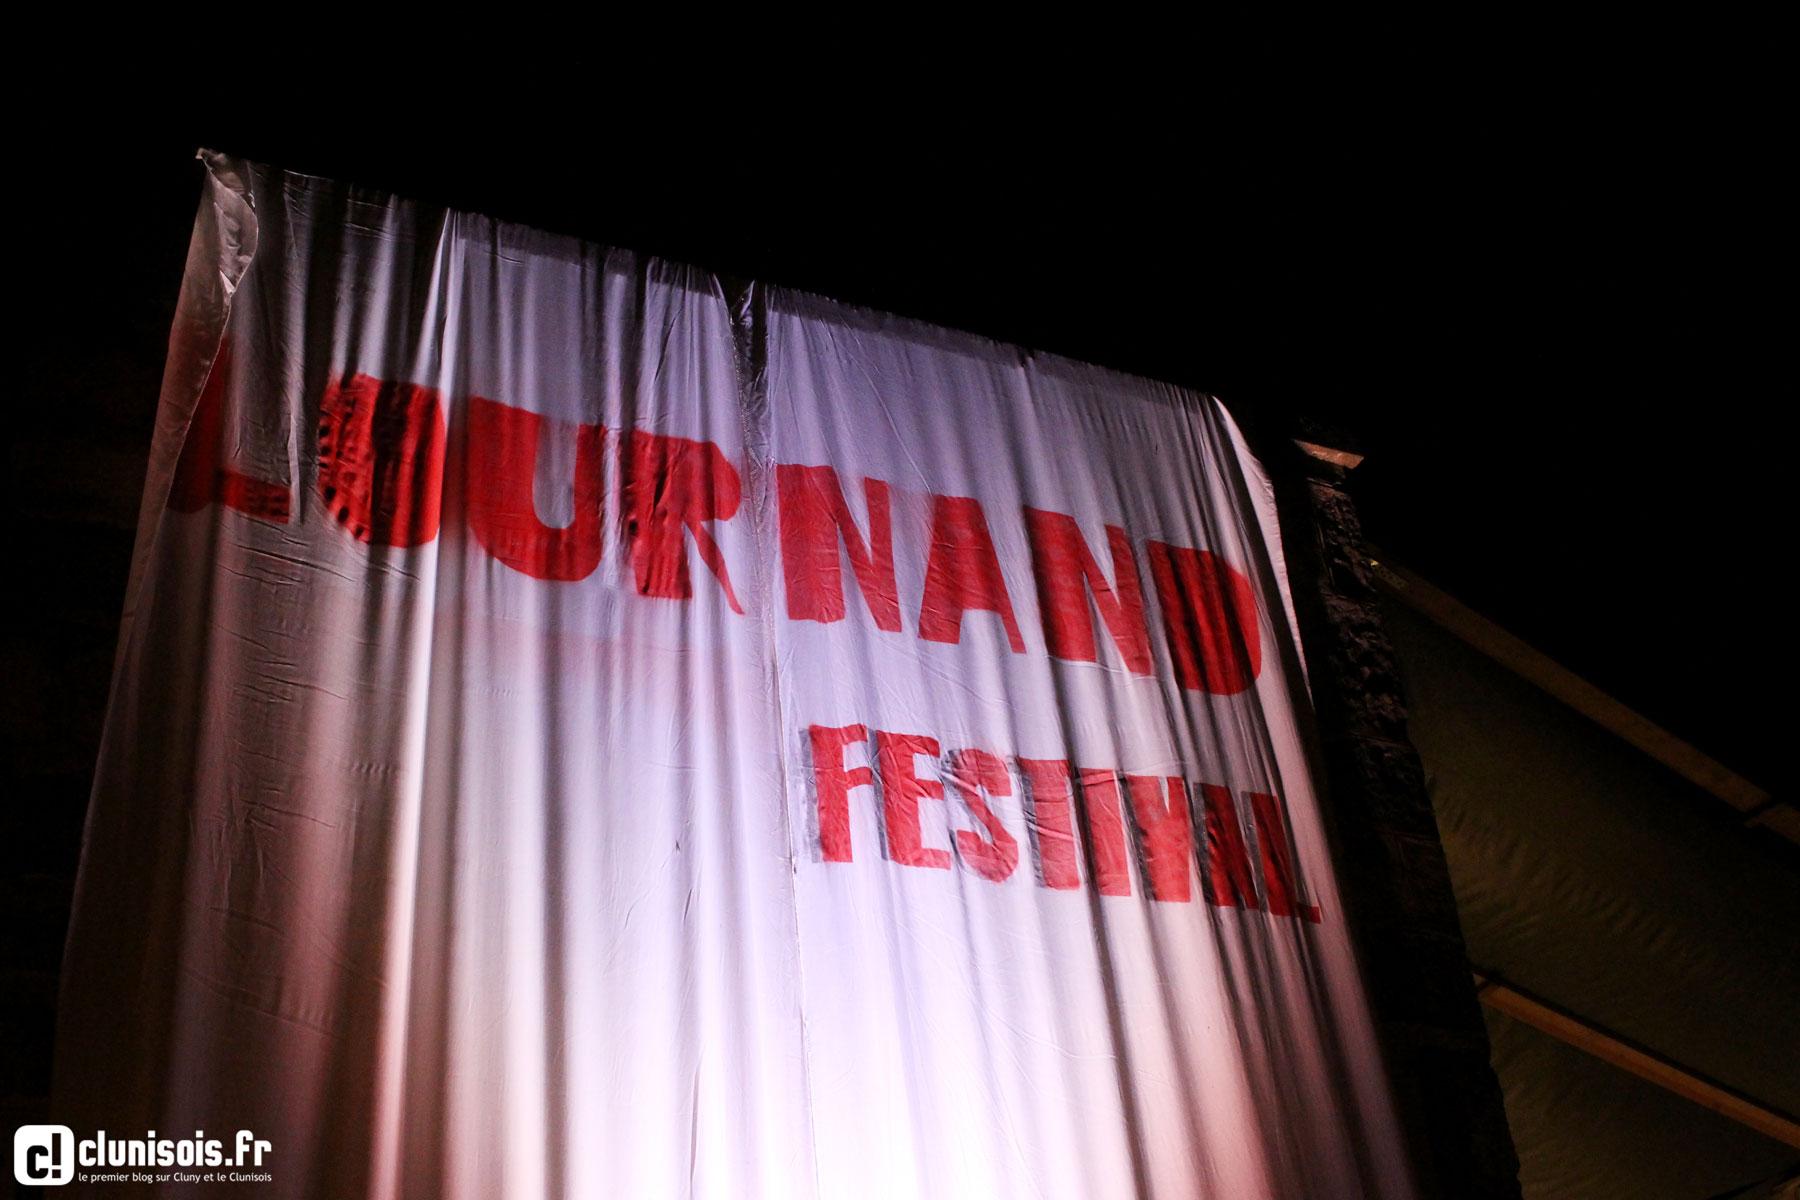 festival-lournand-2016-photo-clunisoisfr-15